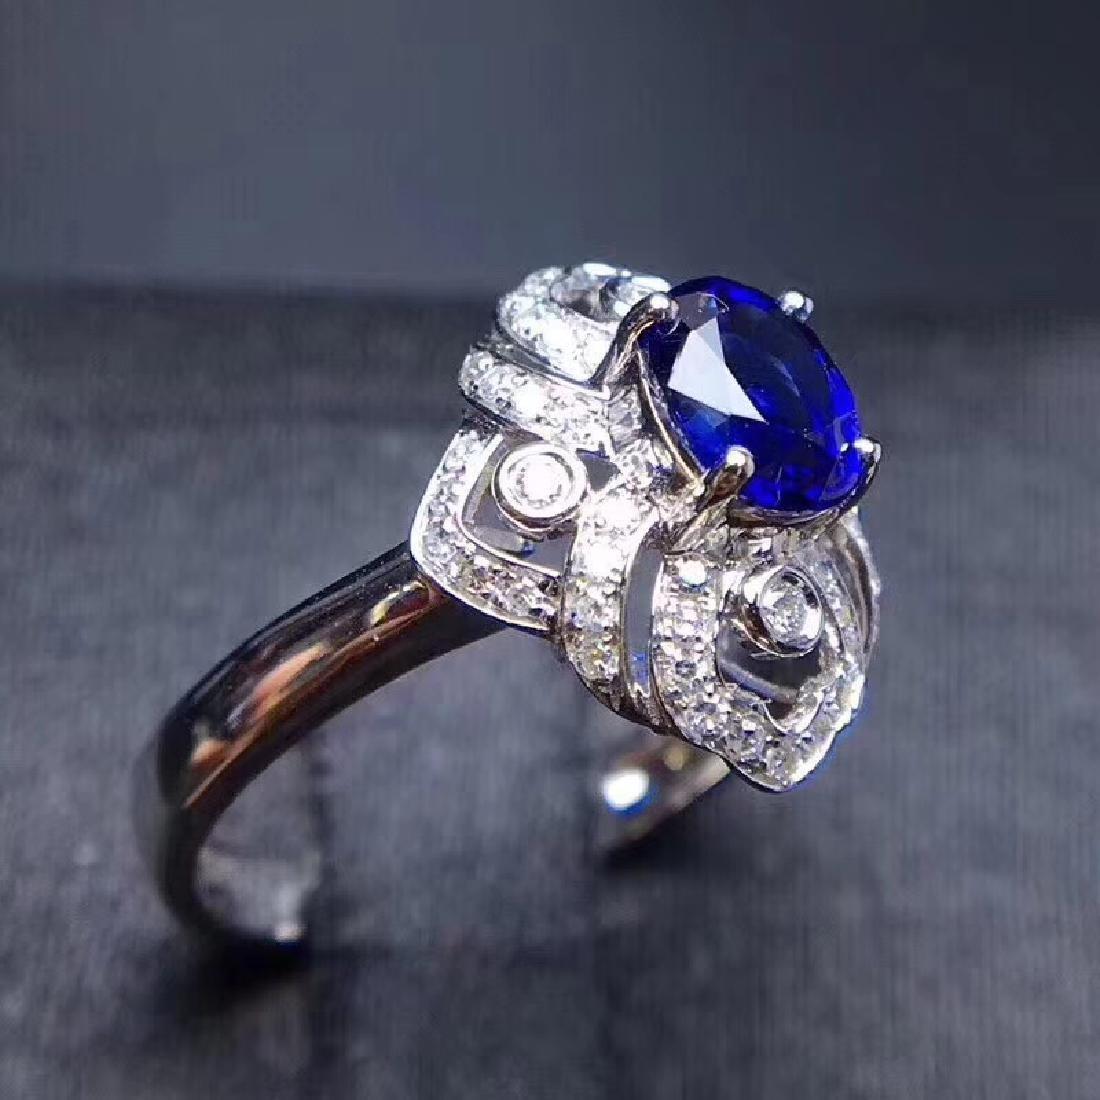 1.18 CTW Sapphire & VS Diamond Ring 18K - 4